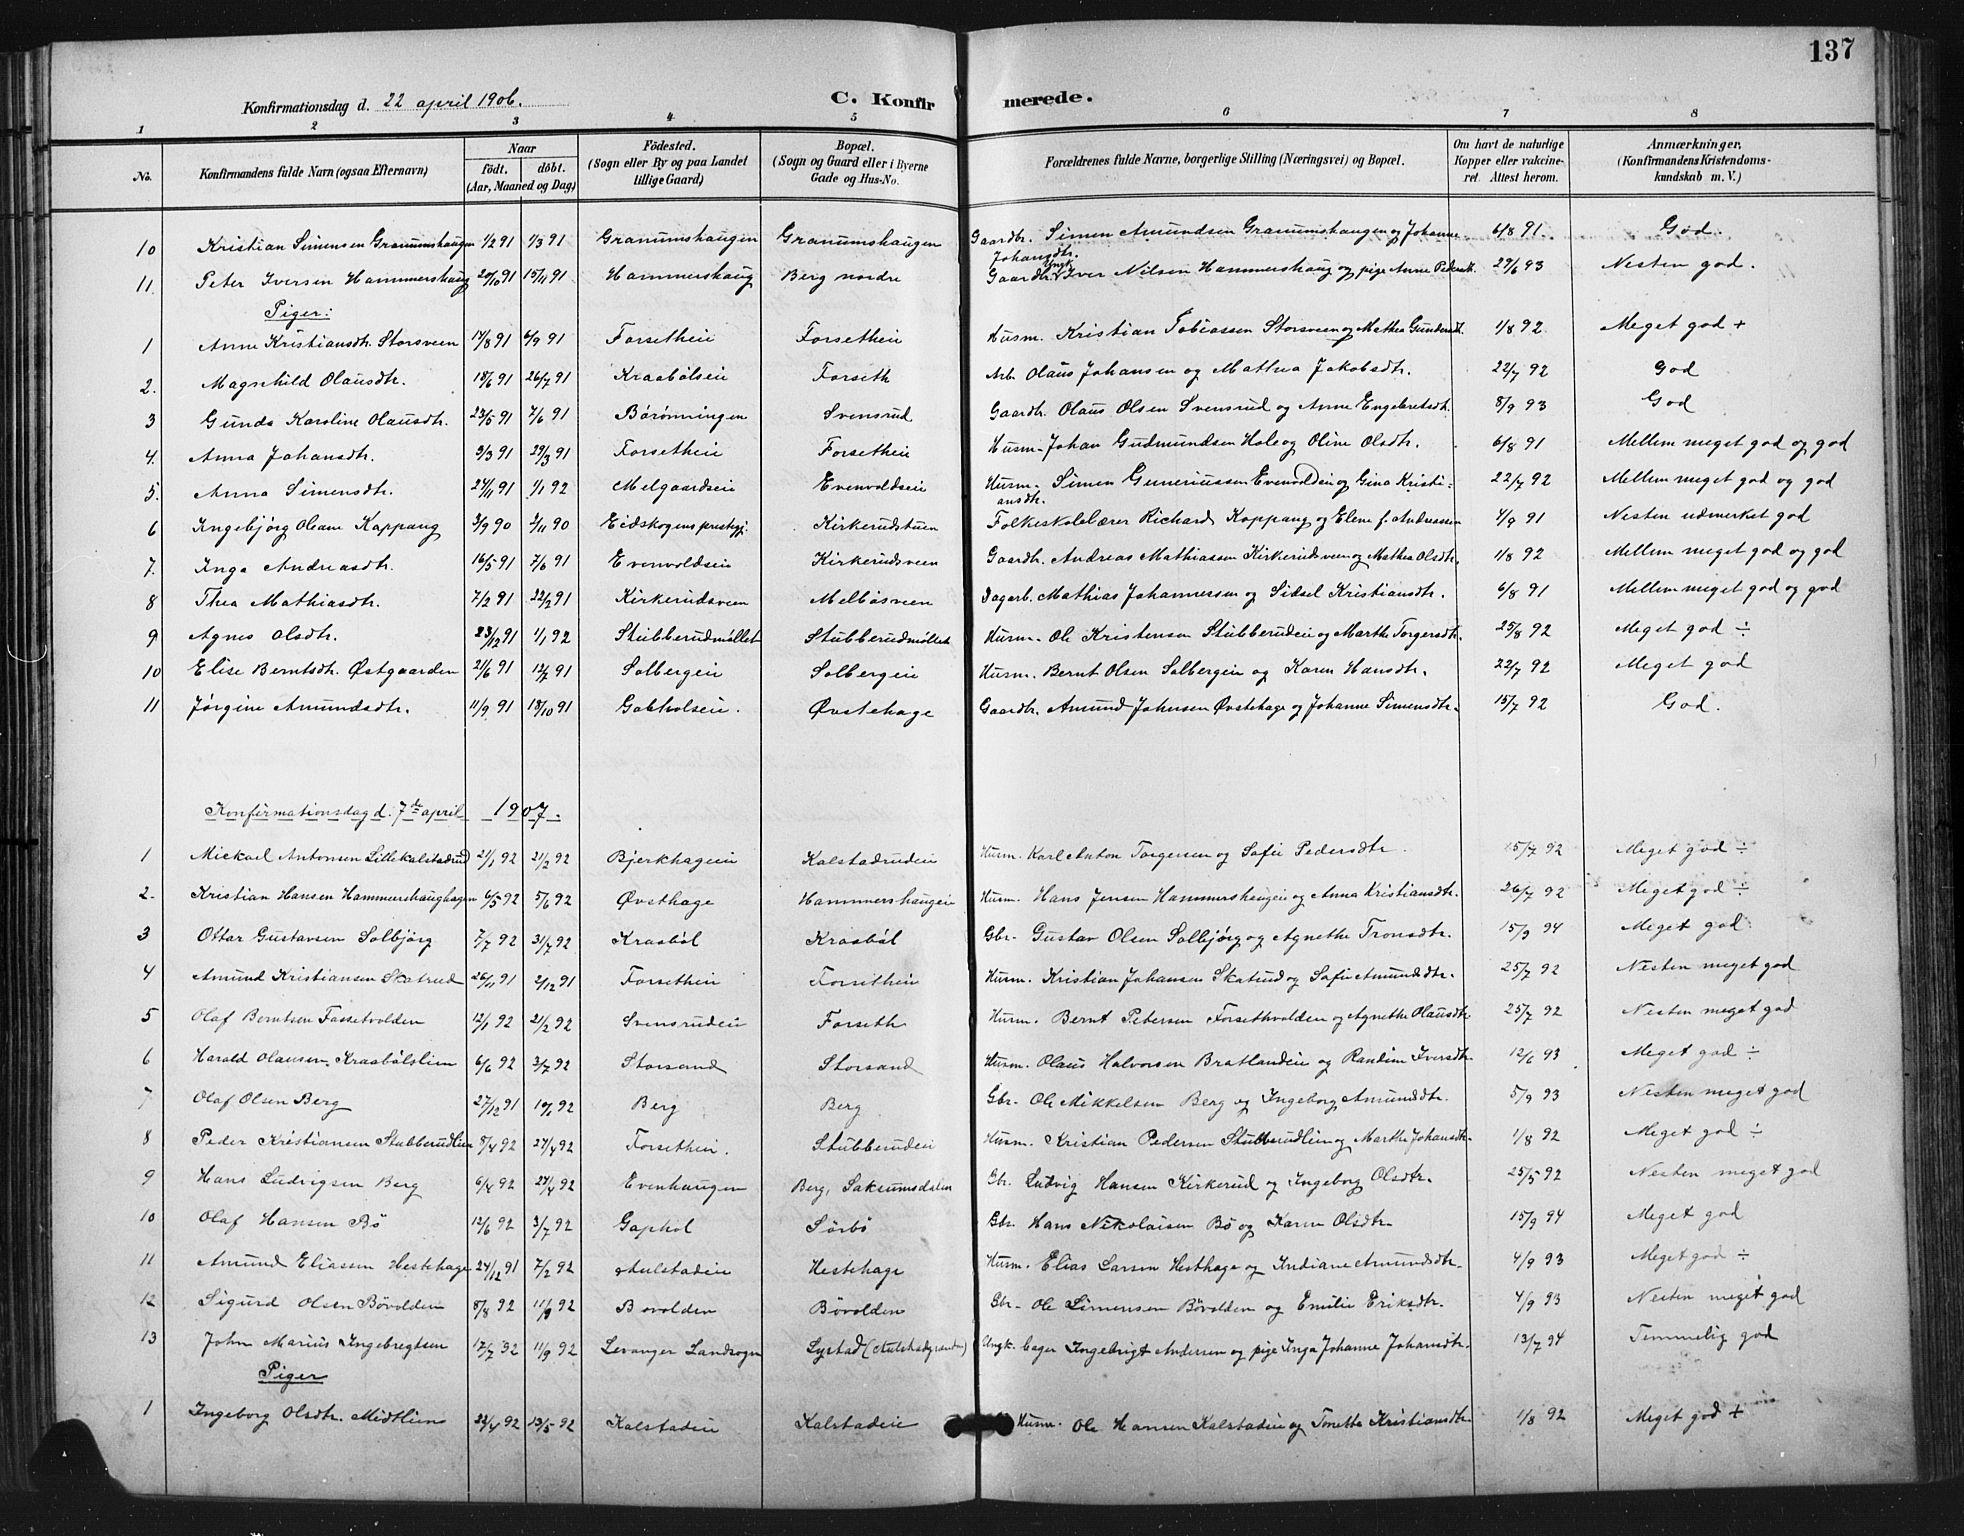 SAH, Vestre Gausdal prestekontor, Klokkerbok nr. 3, 1896-1925, s. 137